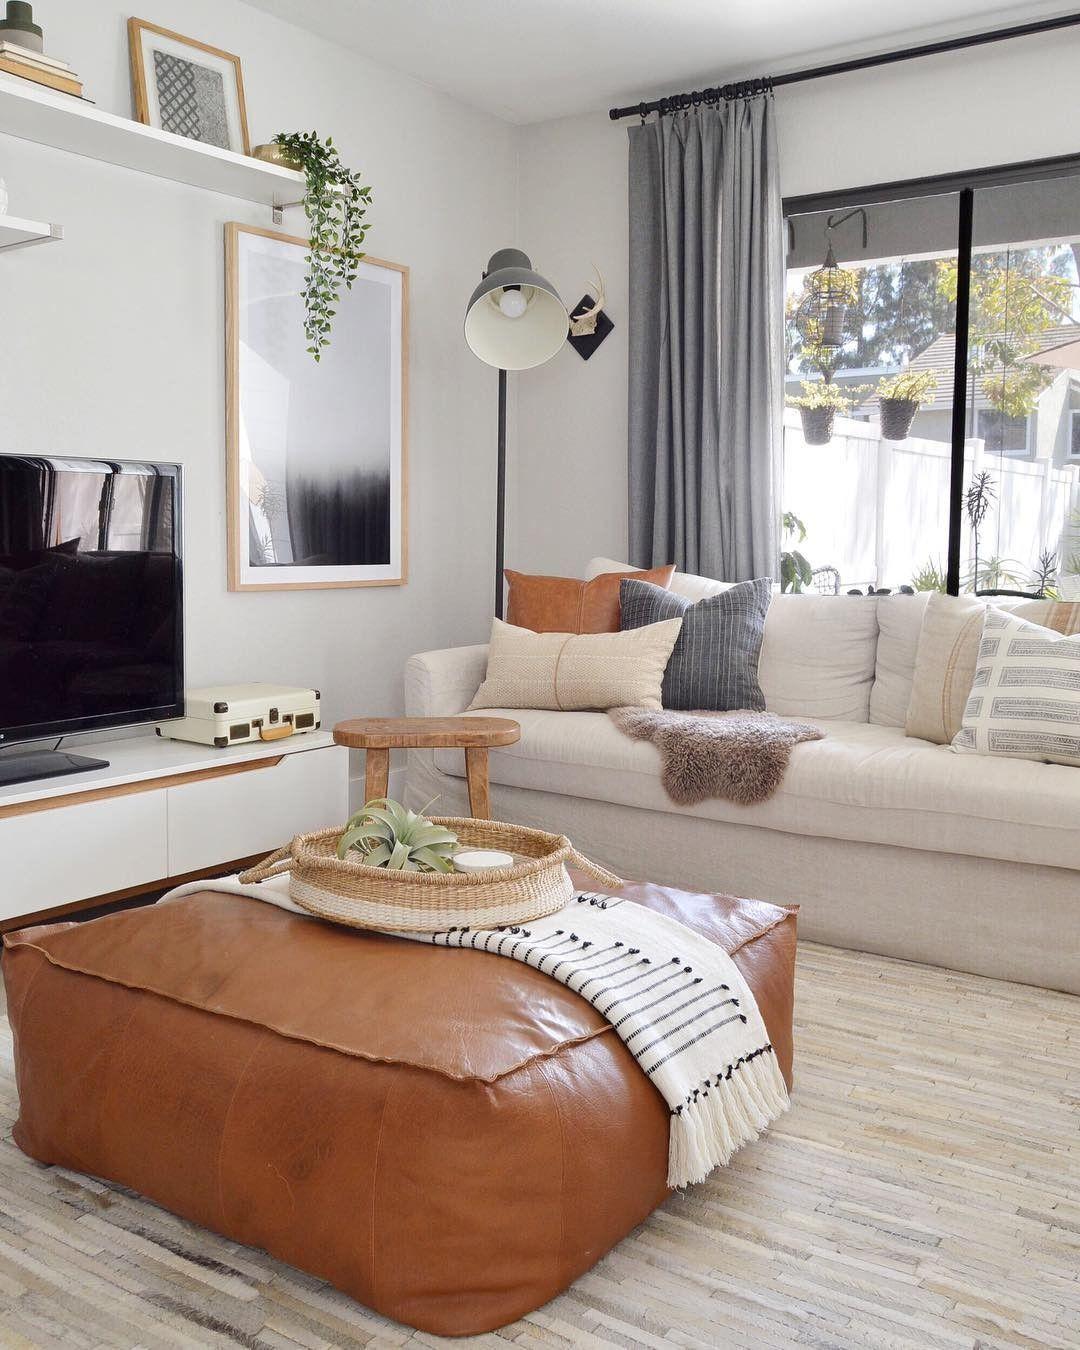 pinmegan enslow on living room  neutral living room